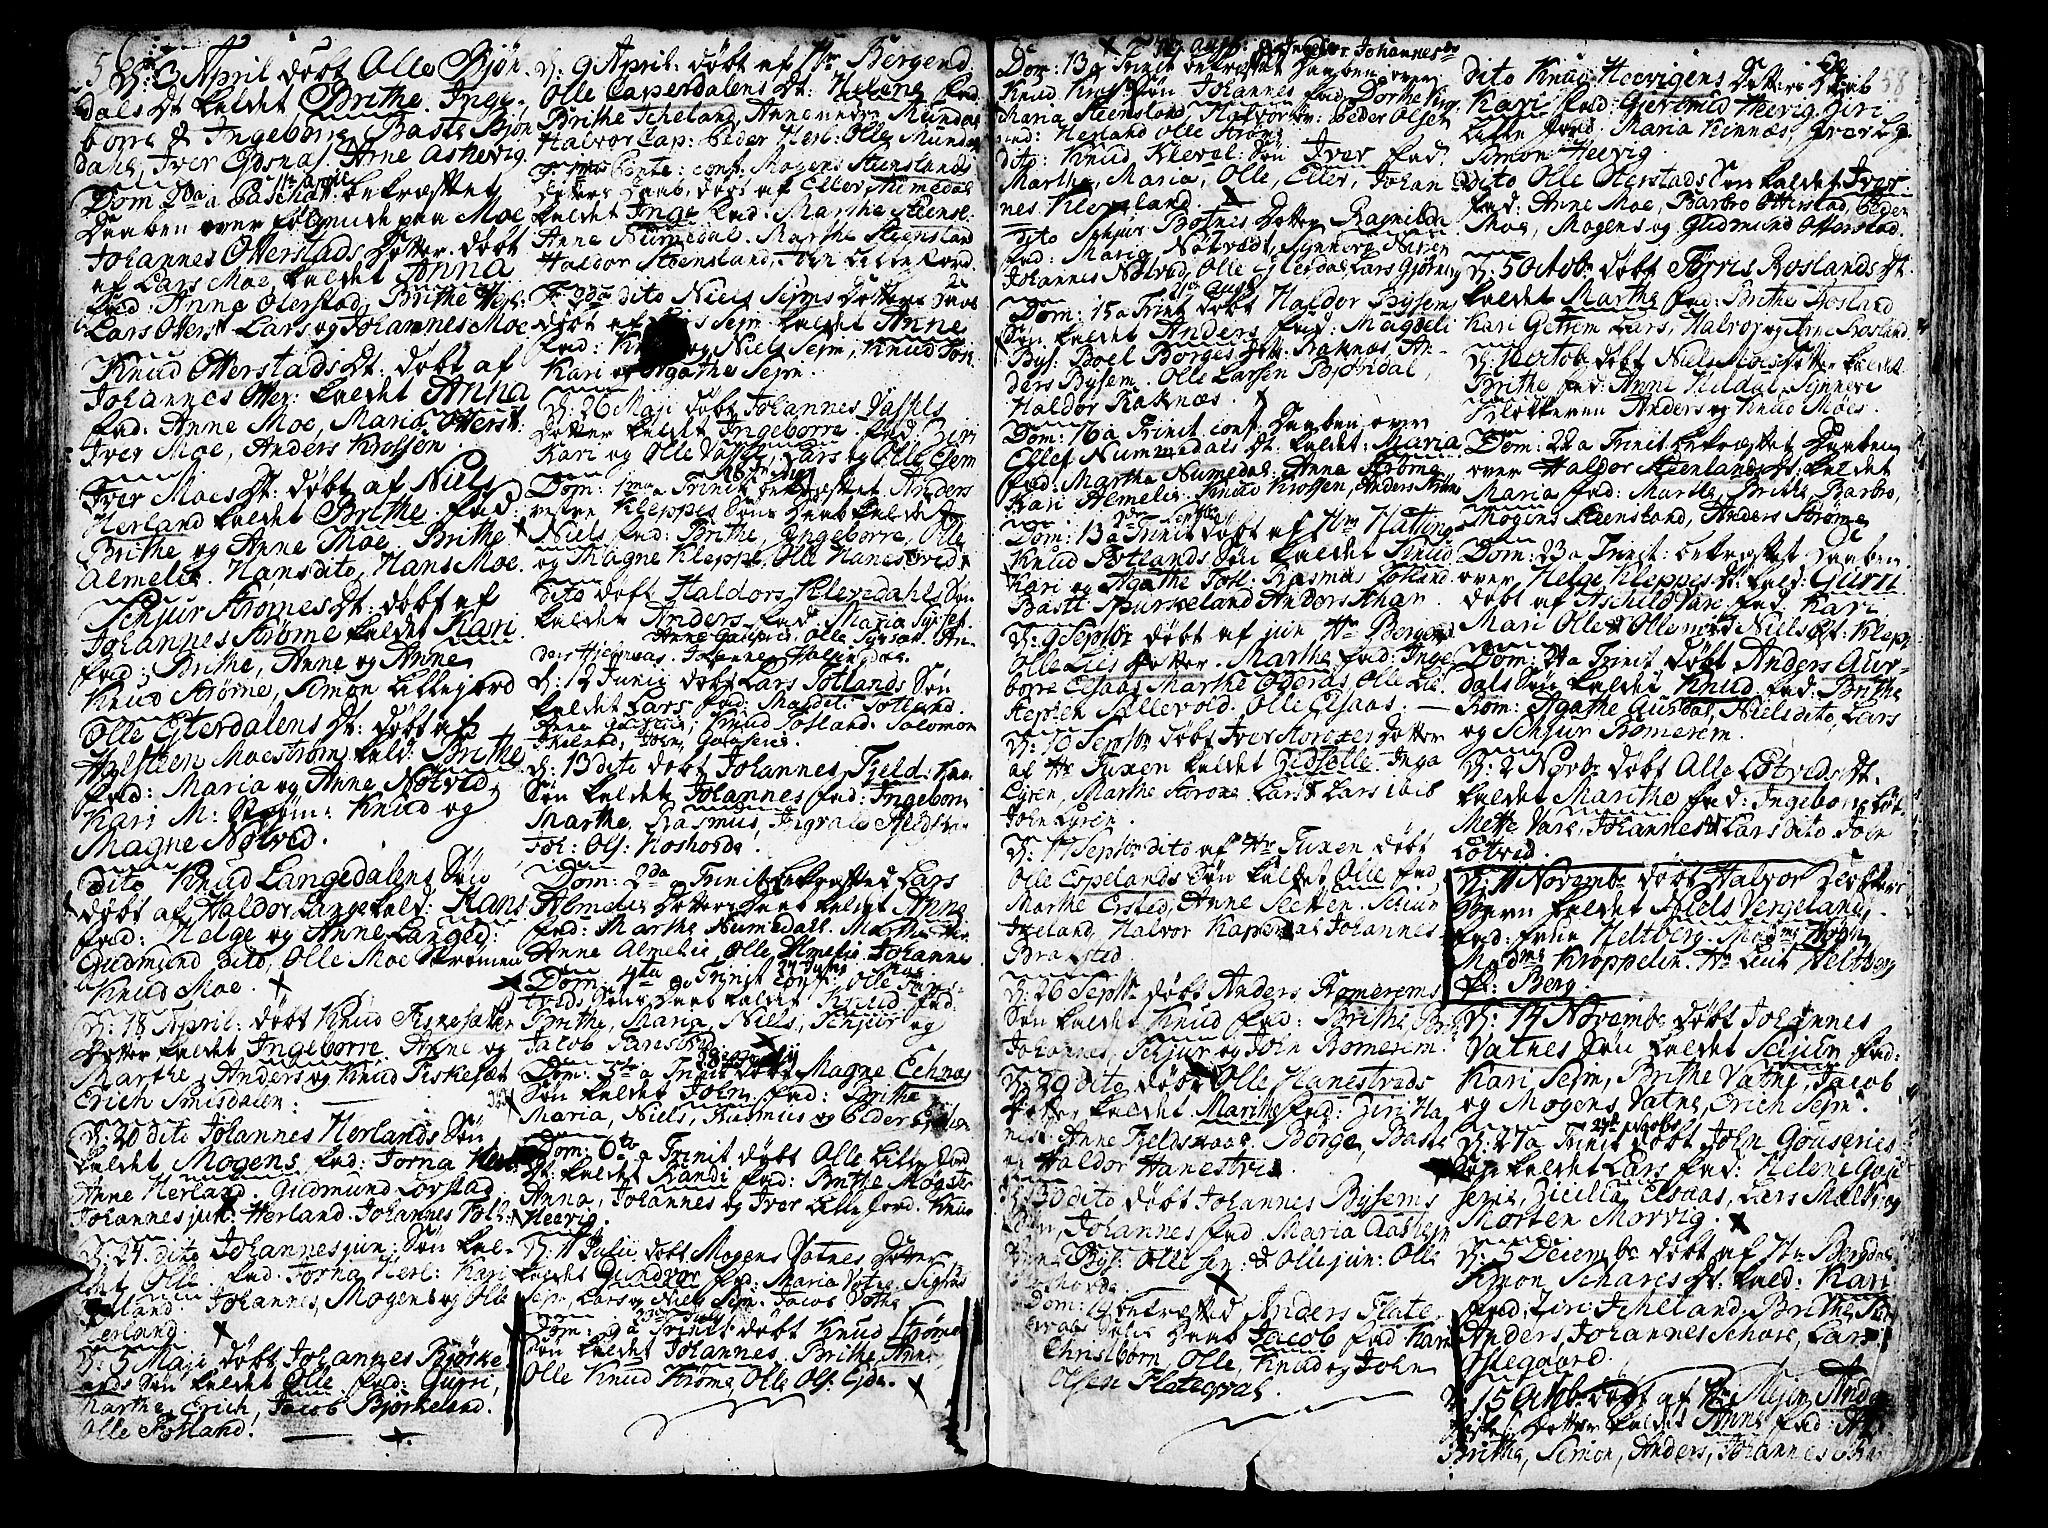 SAB, Hosanger sokneprestembete, H/Haa: Ministerialbok nr. A 2 /1, 1766-1793, s. 58